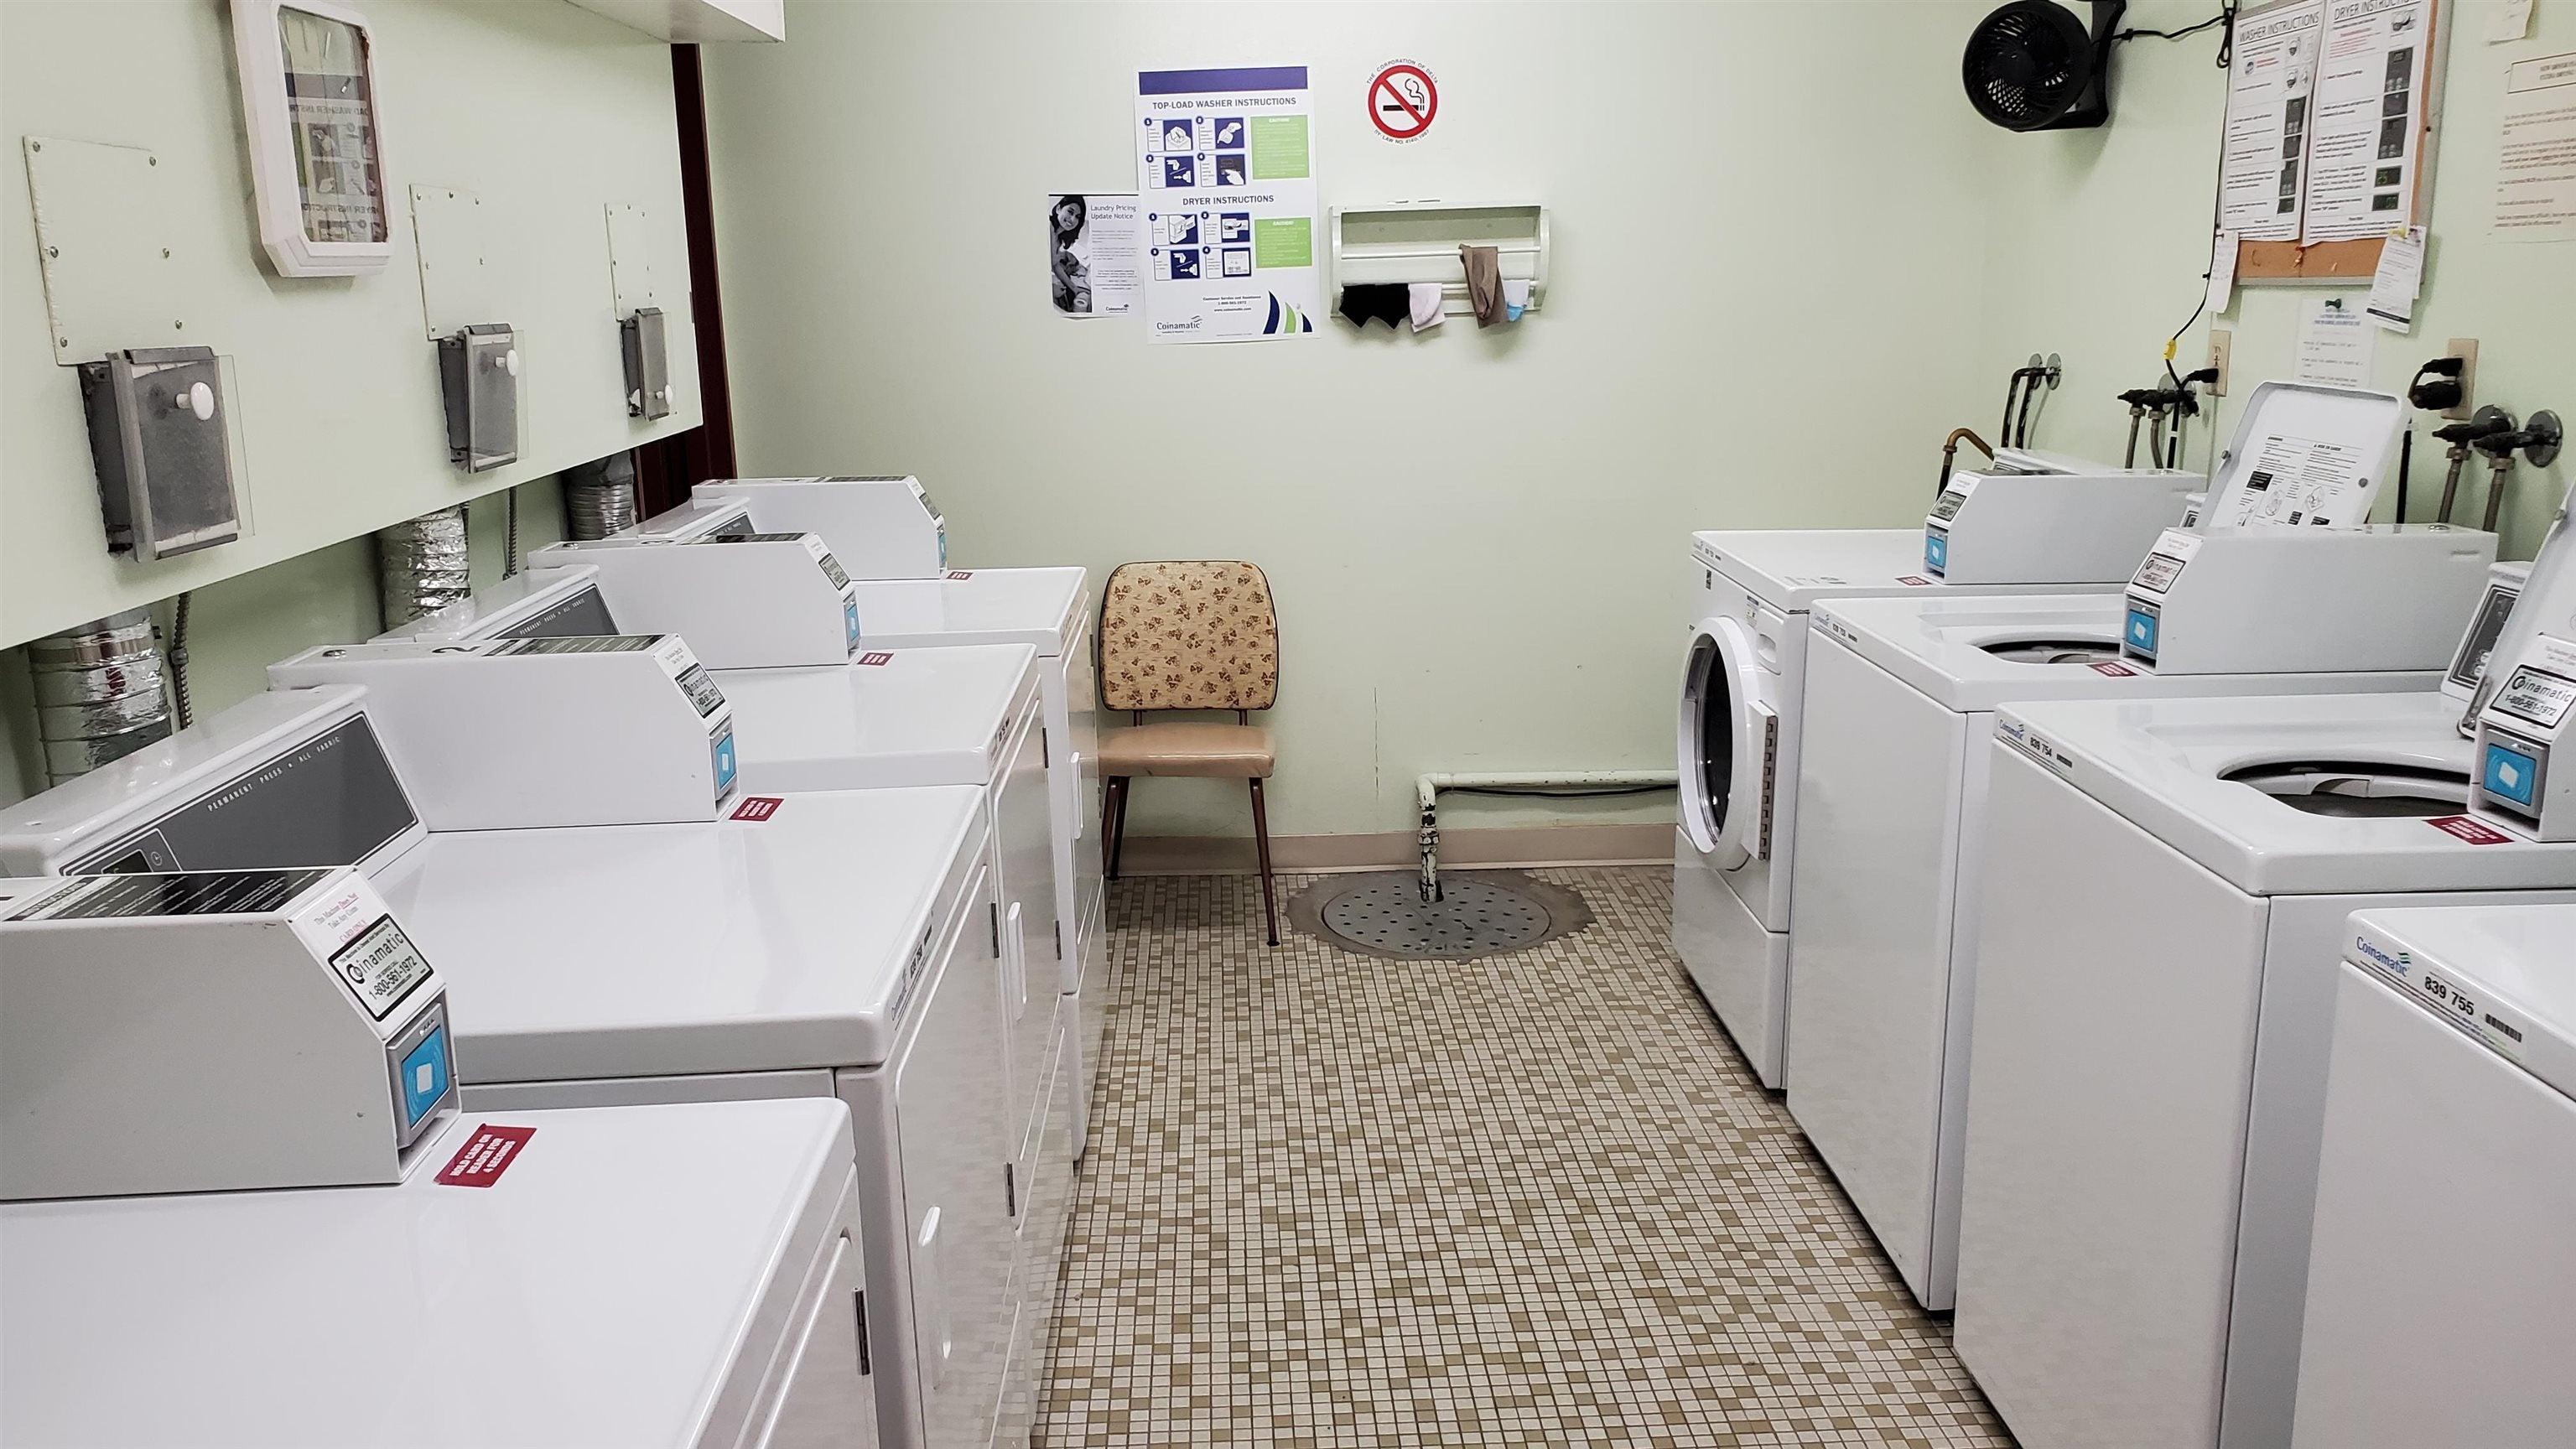 120 11806 88 AVENUE - Annieville Apartment/Condo for sale, 2 Bedrooms (R2616862) - #11